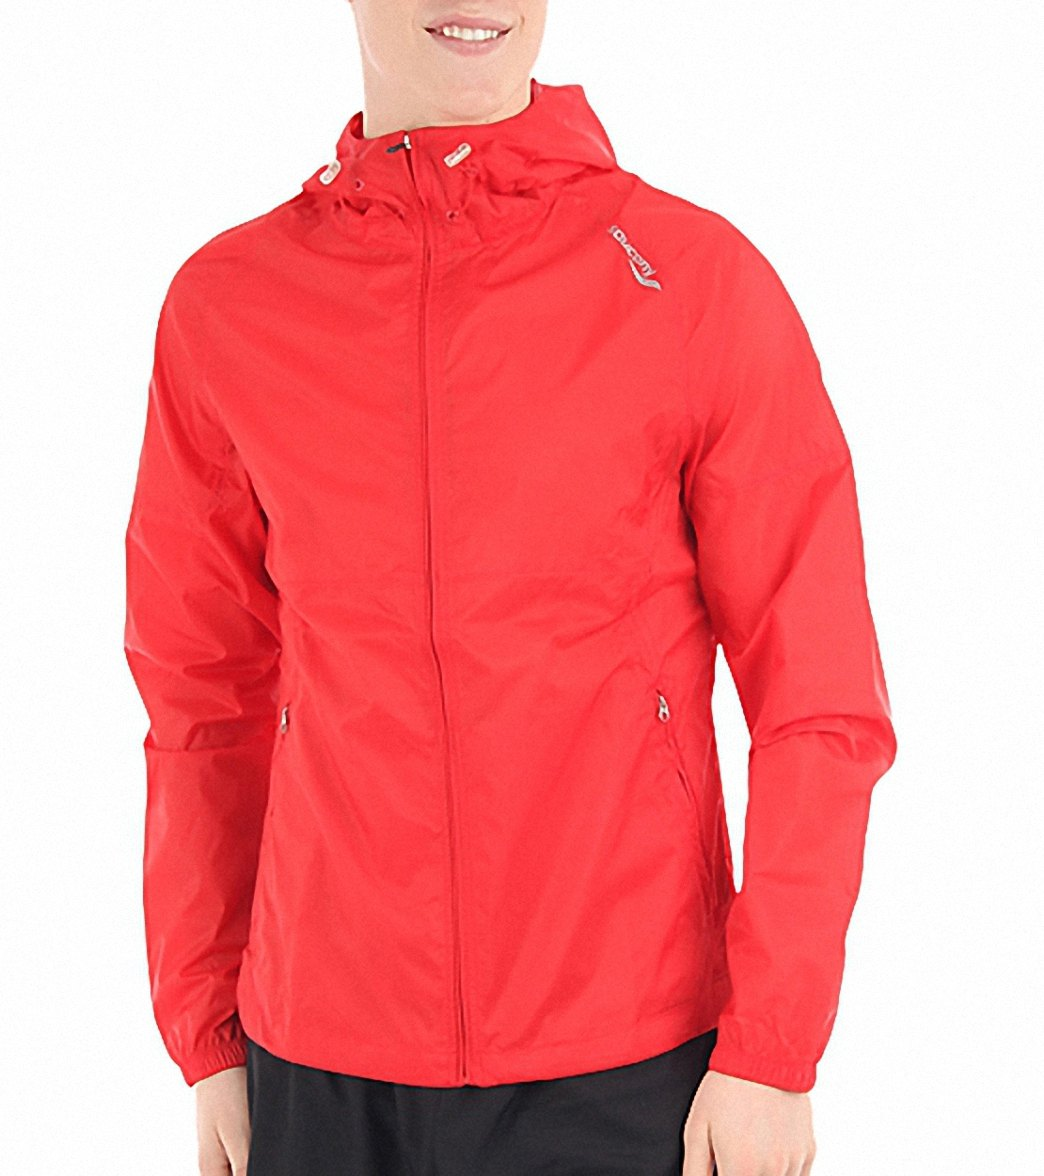 Saucony Men S Palladium Packable Running Jacket At